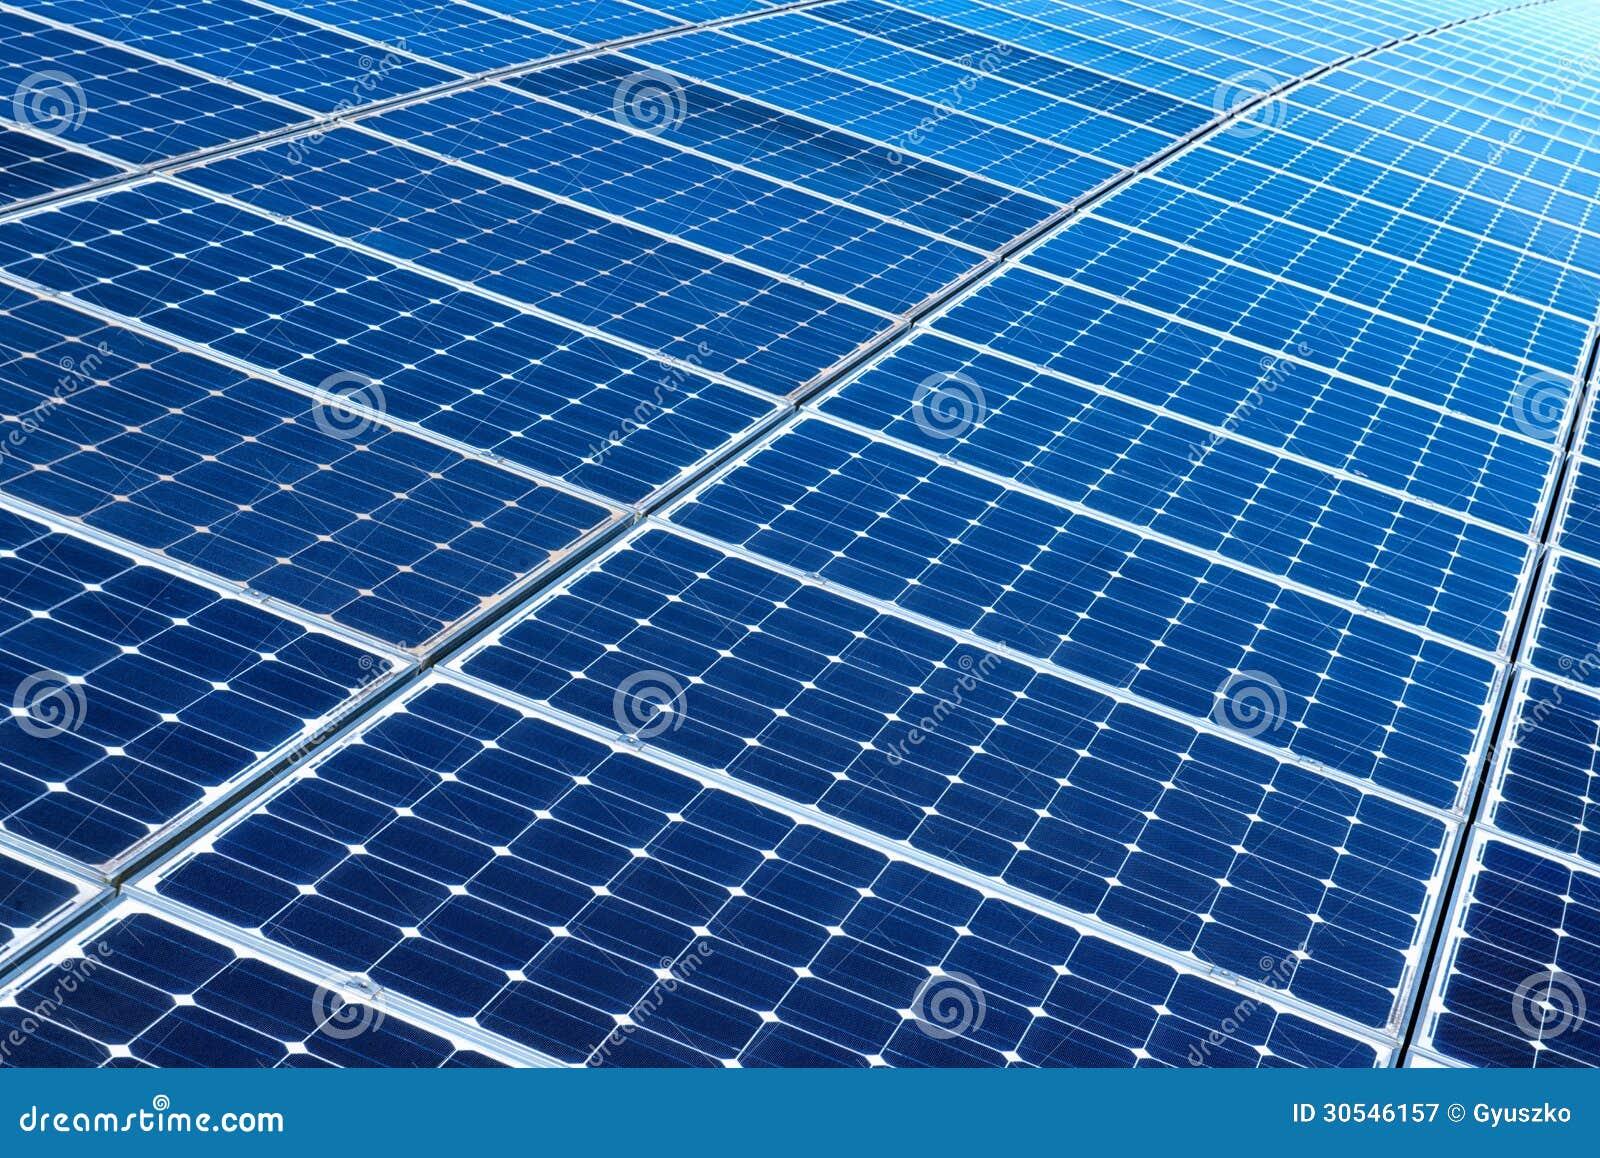 solar panel background - photo #22